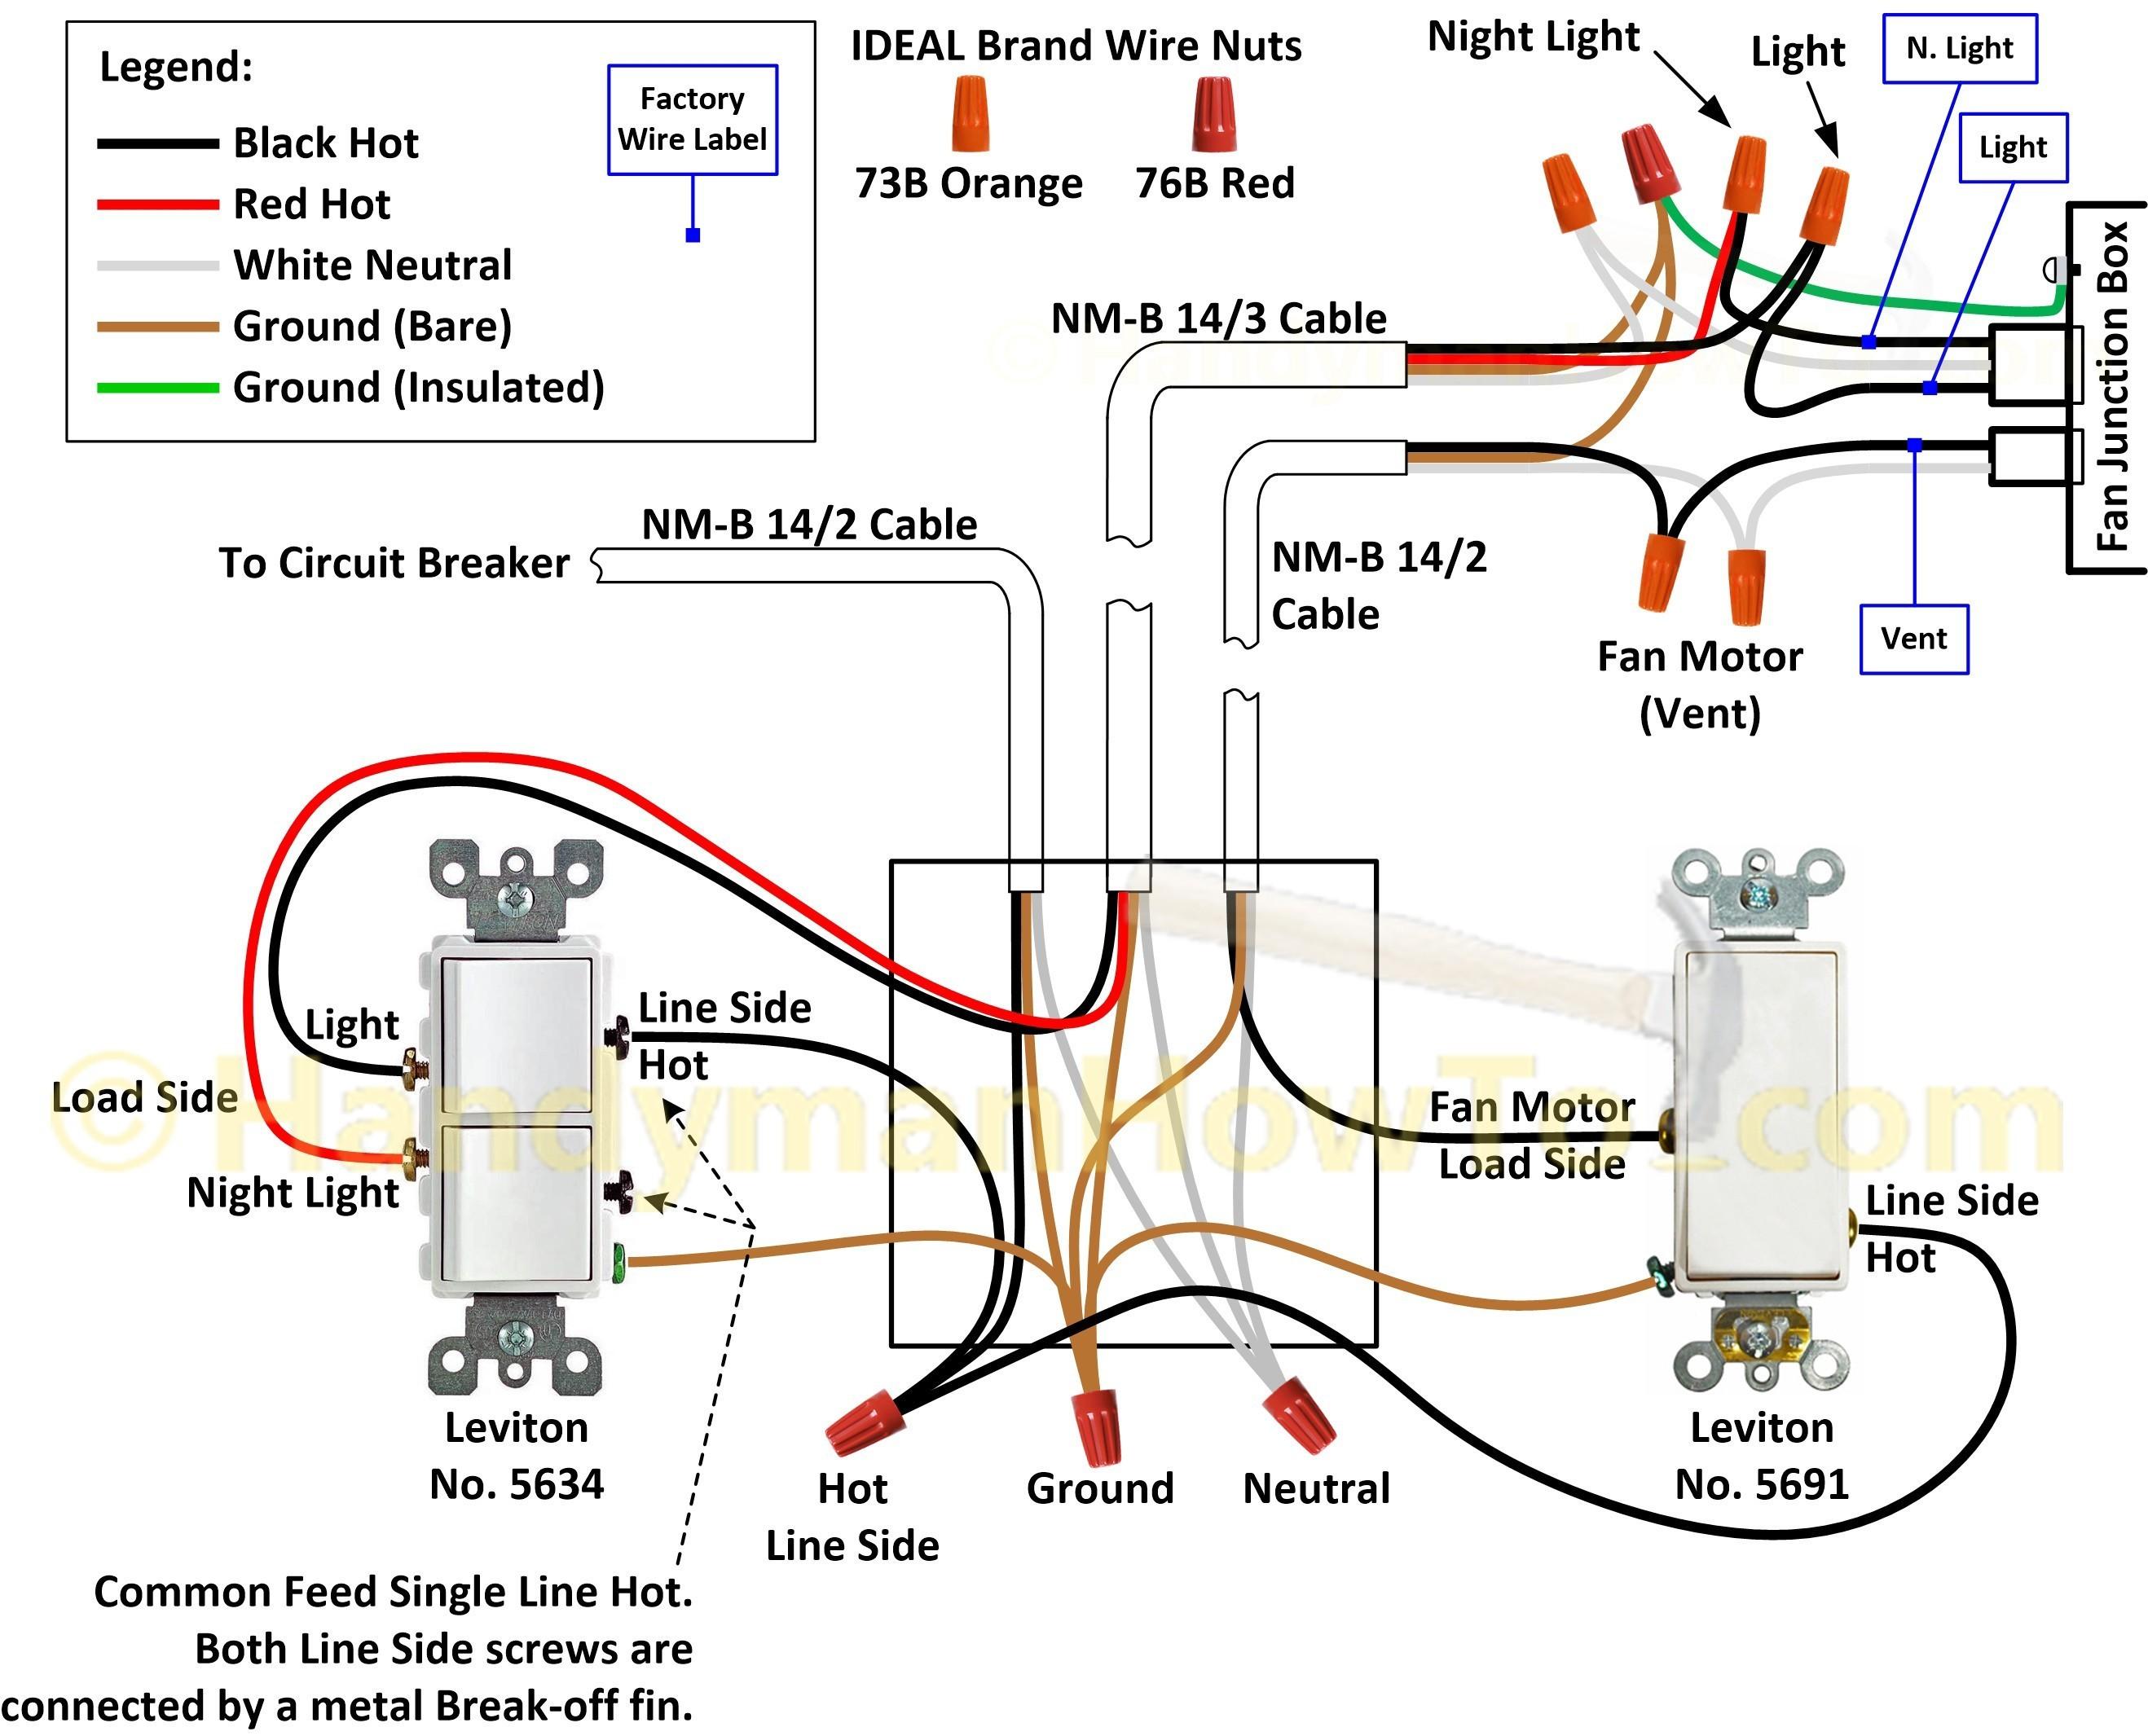 3 wire condenser fan motor diagram detailed wiring diagrams century motors wiring-diagram wire colors condenser fan motor 3 wire to 4 wire diagram electrical wiring electric motor diagram 3 wire condenser fan motor diagram